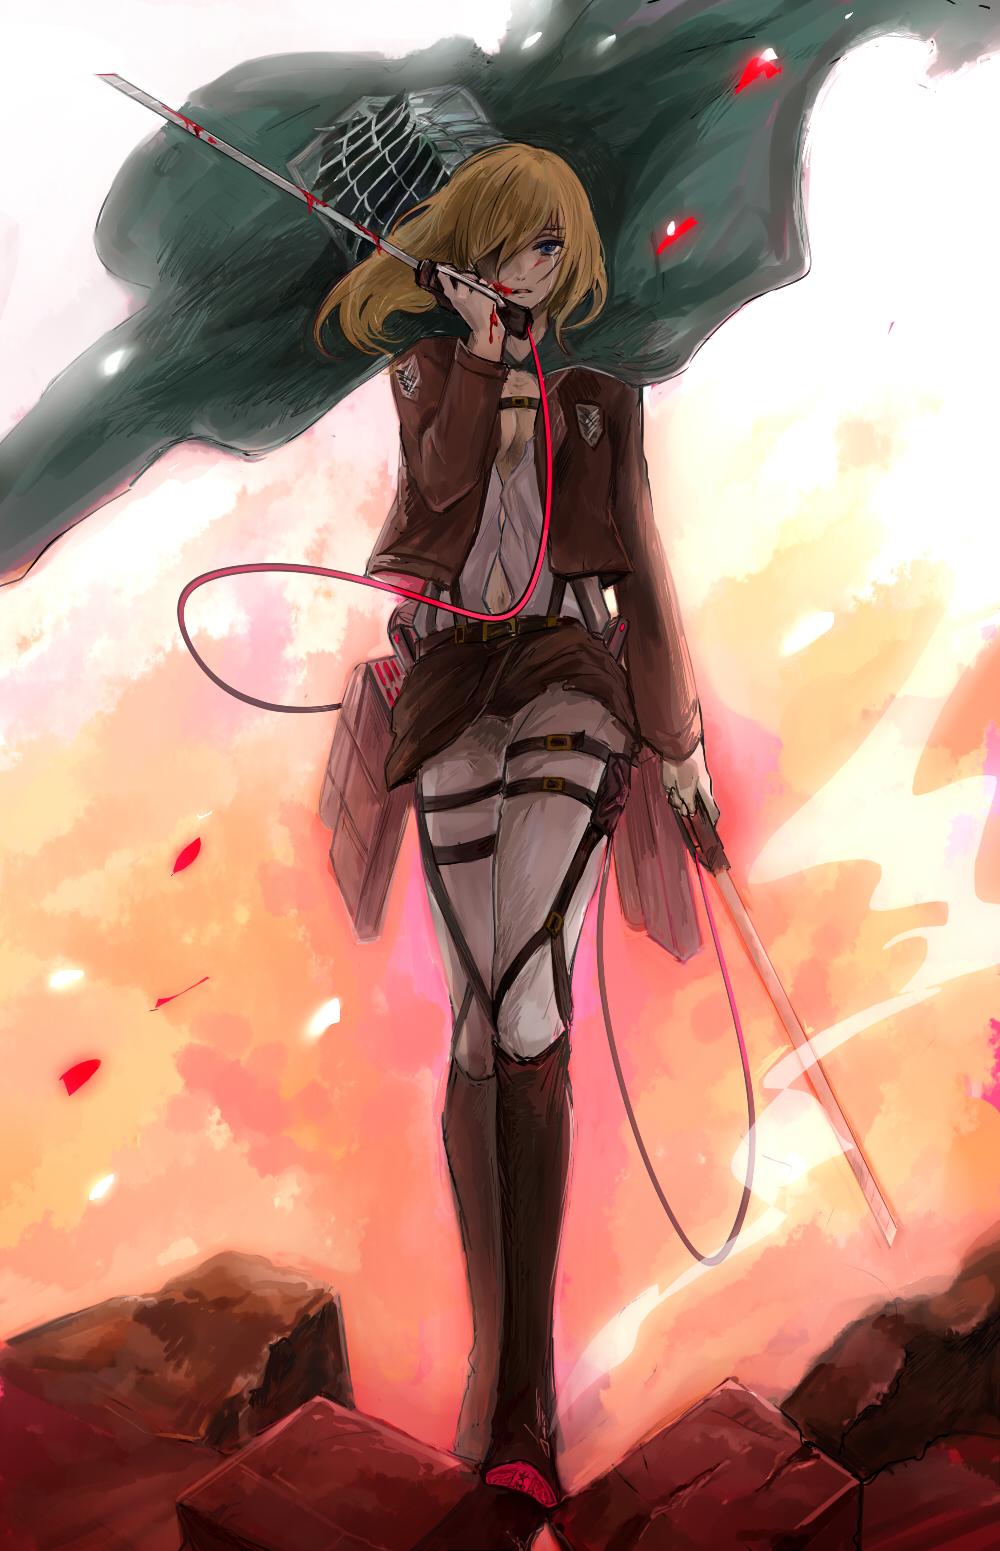 Christa Renz Attack On Titan Mobile Wallpaper 1600444 Zerochan Anime Image Board